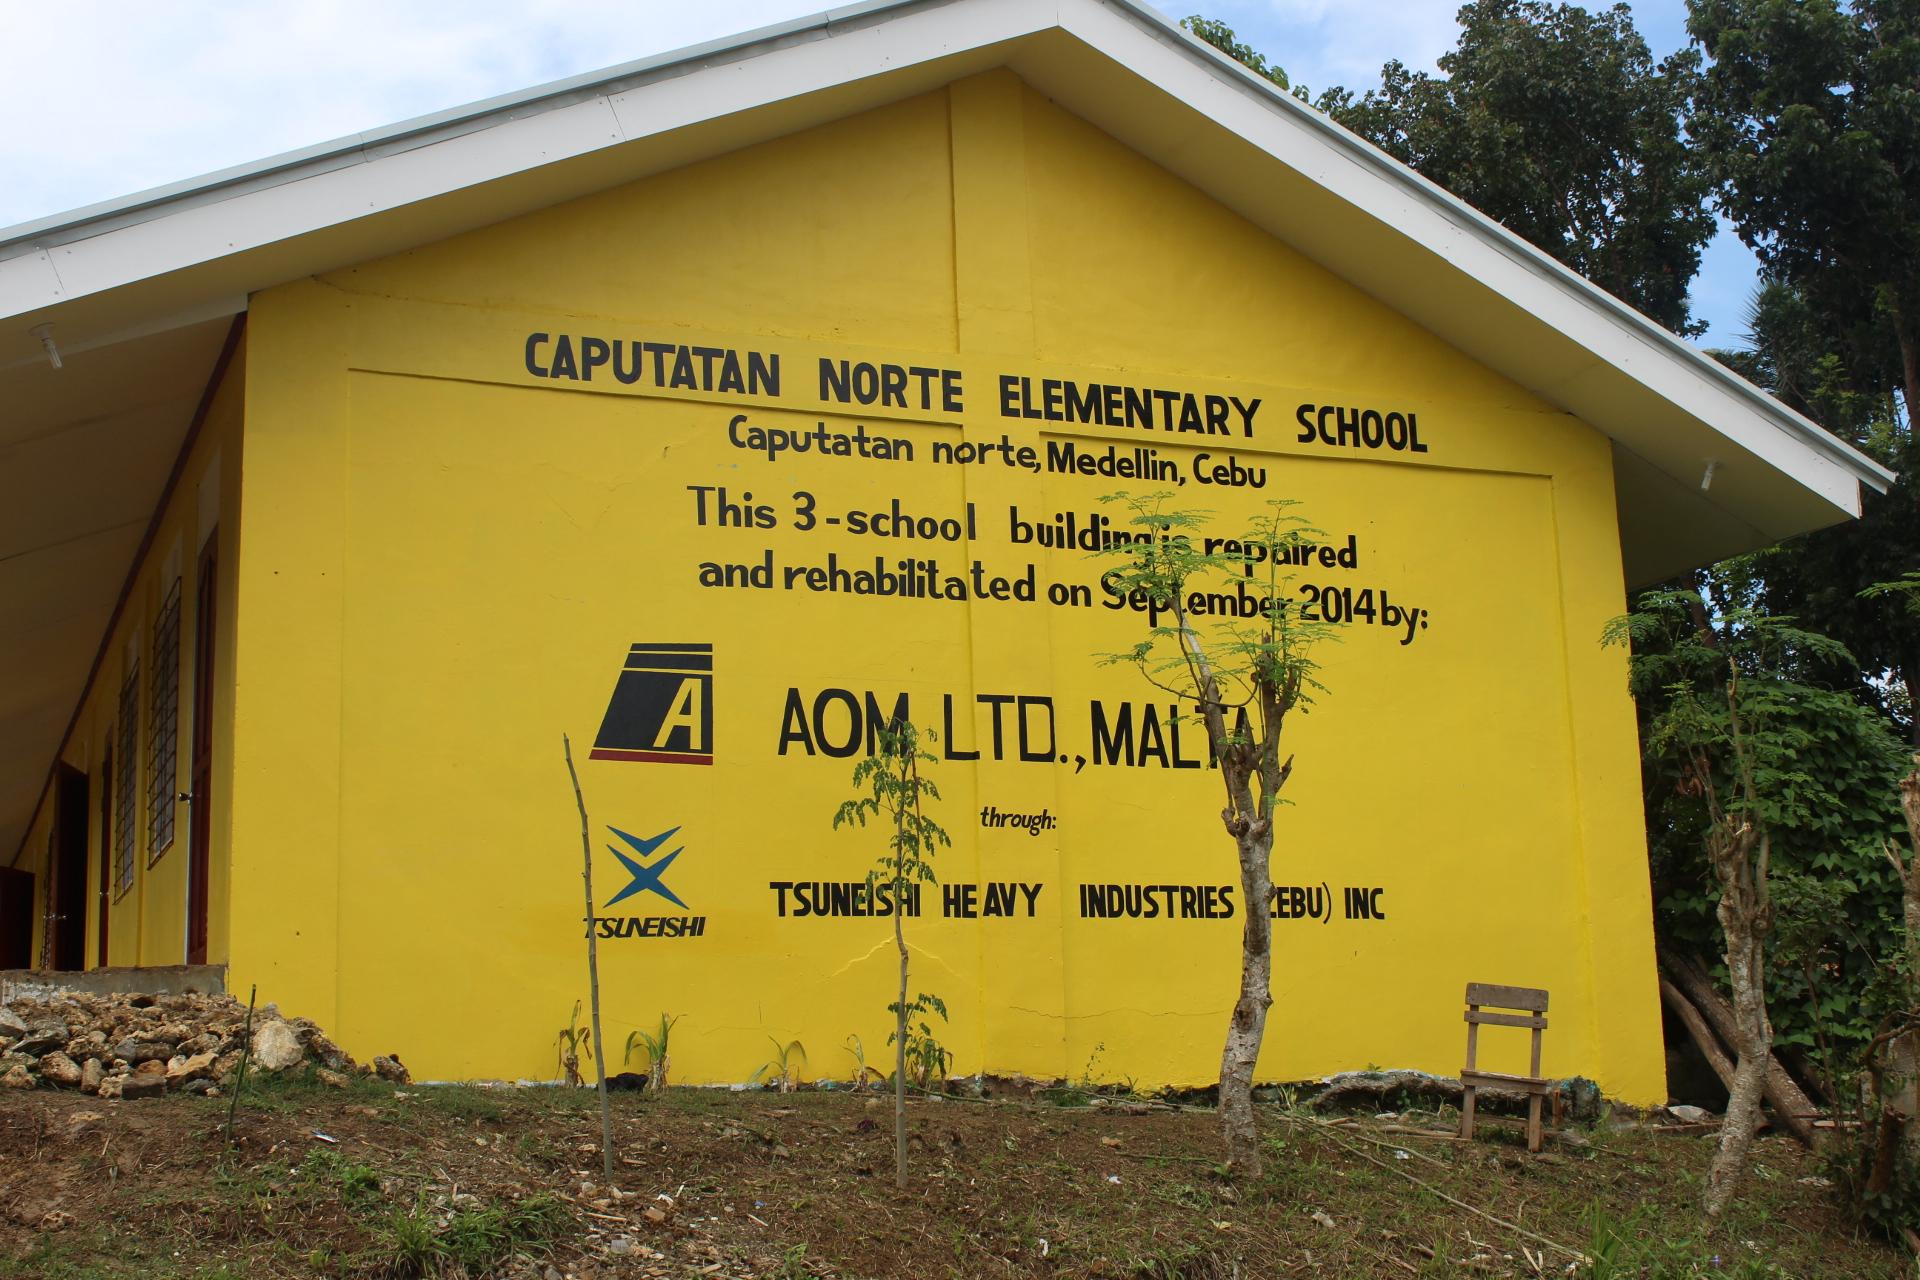 TSUNEISHI HEAVY INDUSTRIES (CEBU), Inc.を通じて海外船主会社がフィリピン台風被災支援~セブ島北部2つの小学校校舎を修繕し、校舎交付式を行いました~